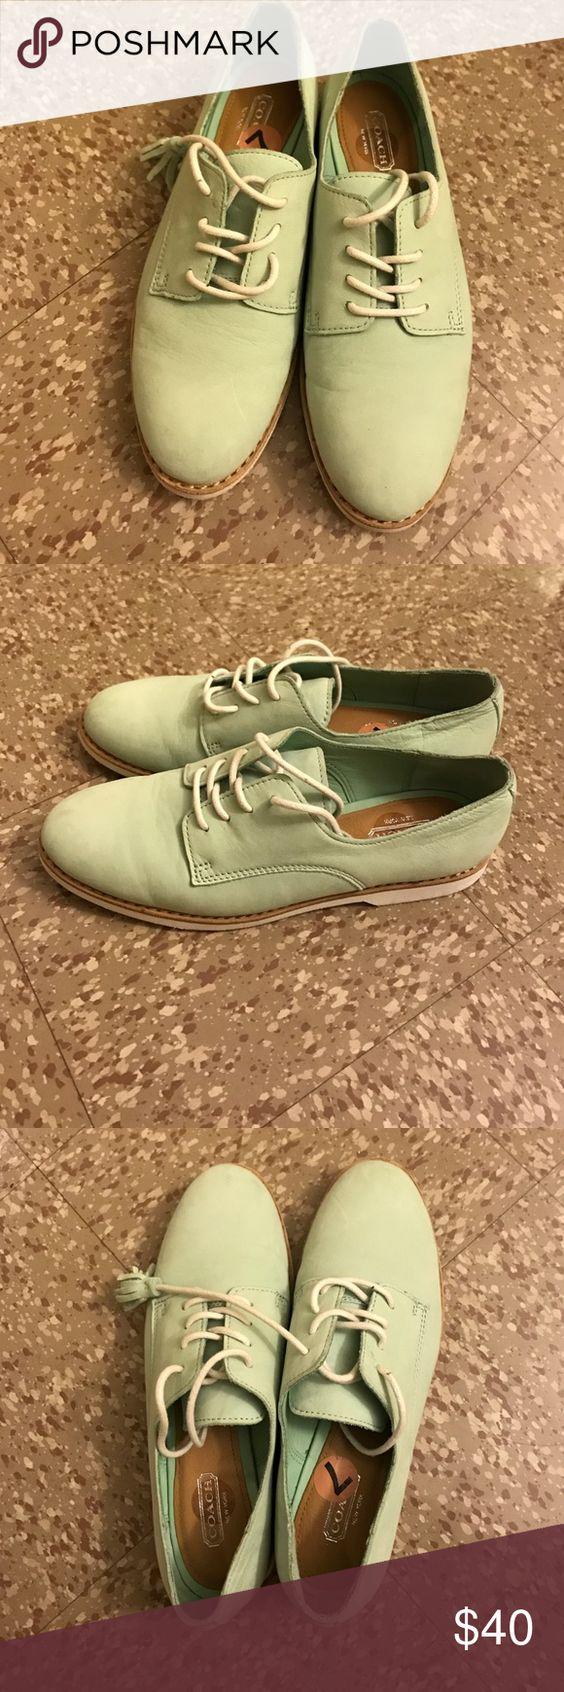 coach plats blue coach flats Coach Shoes Flats & Loafers